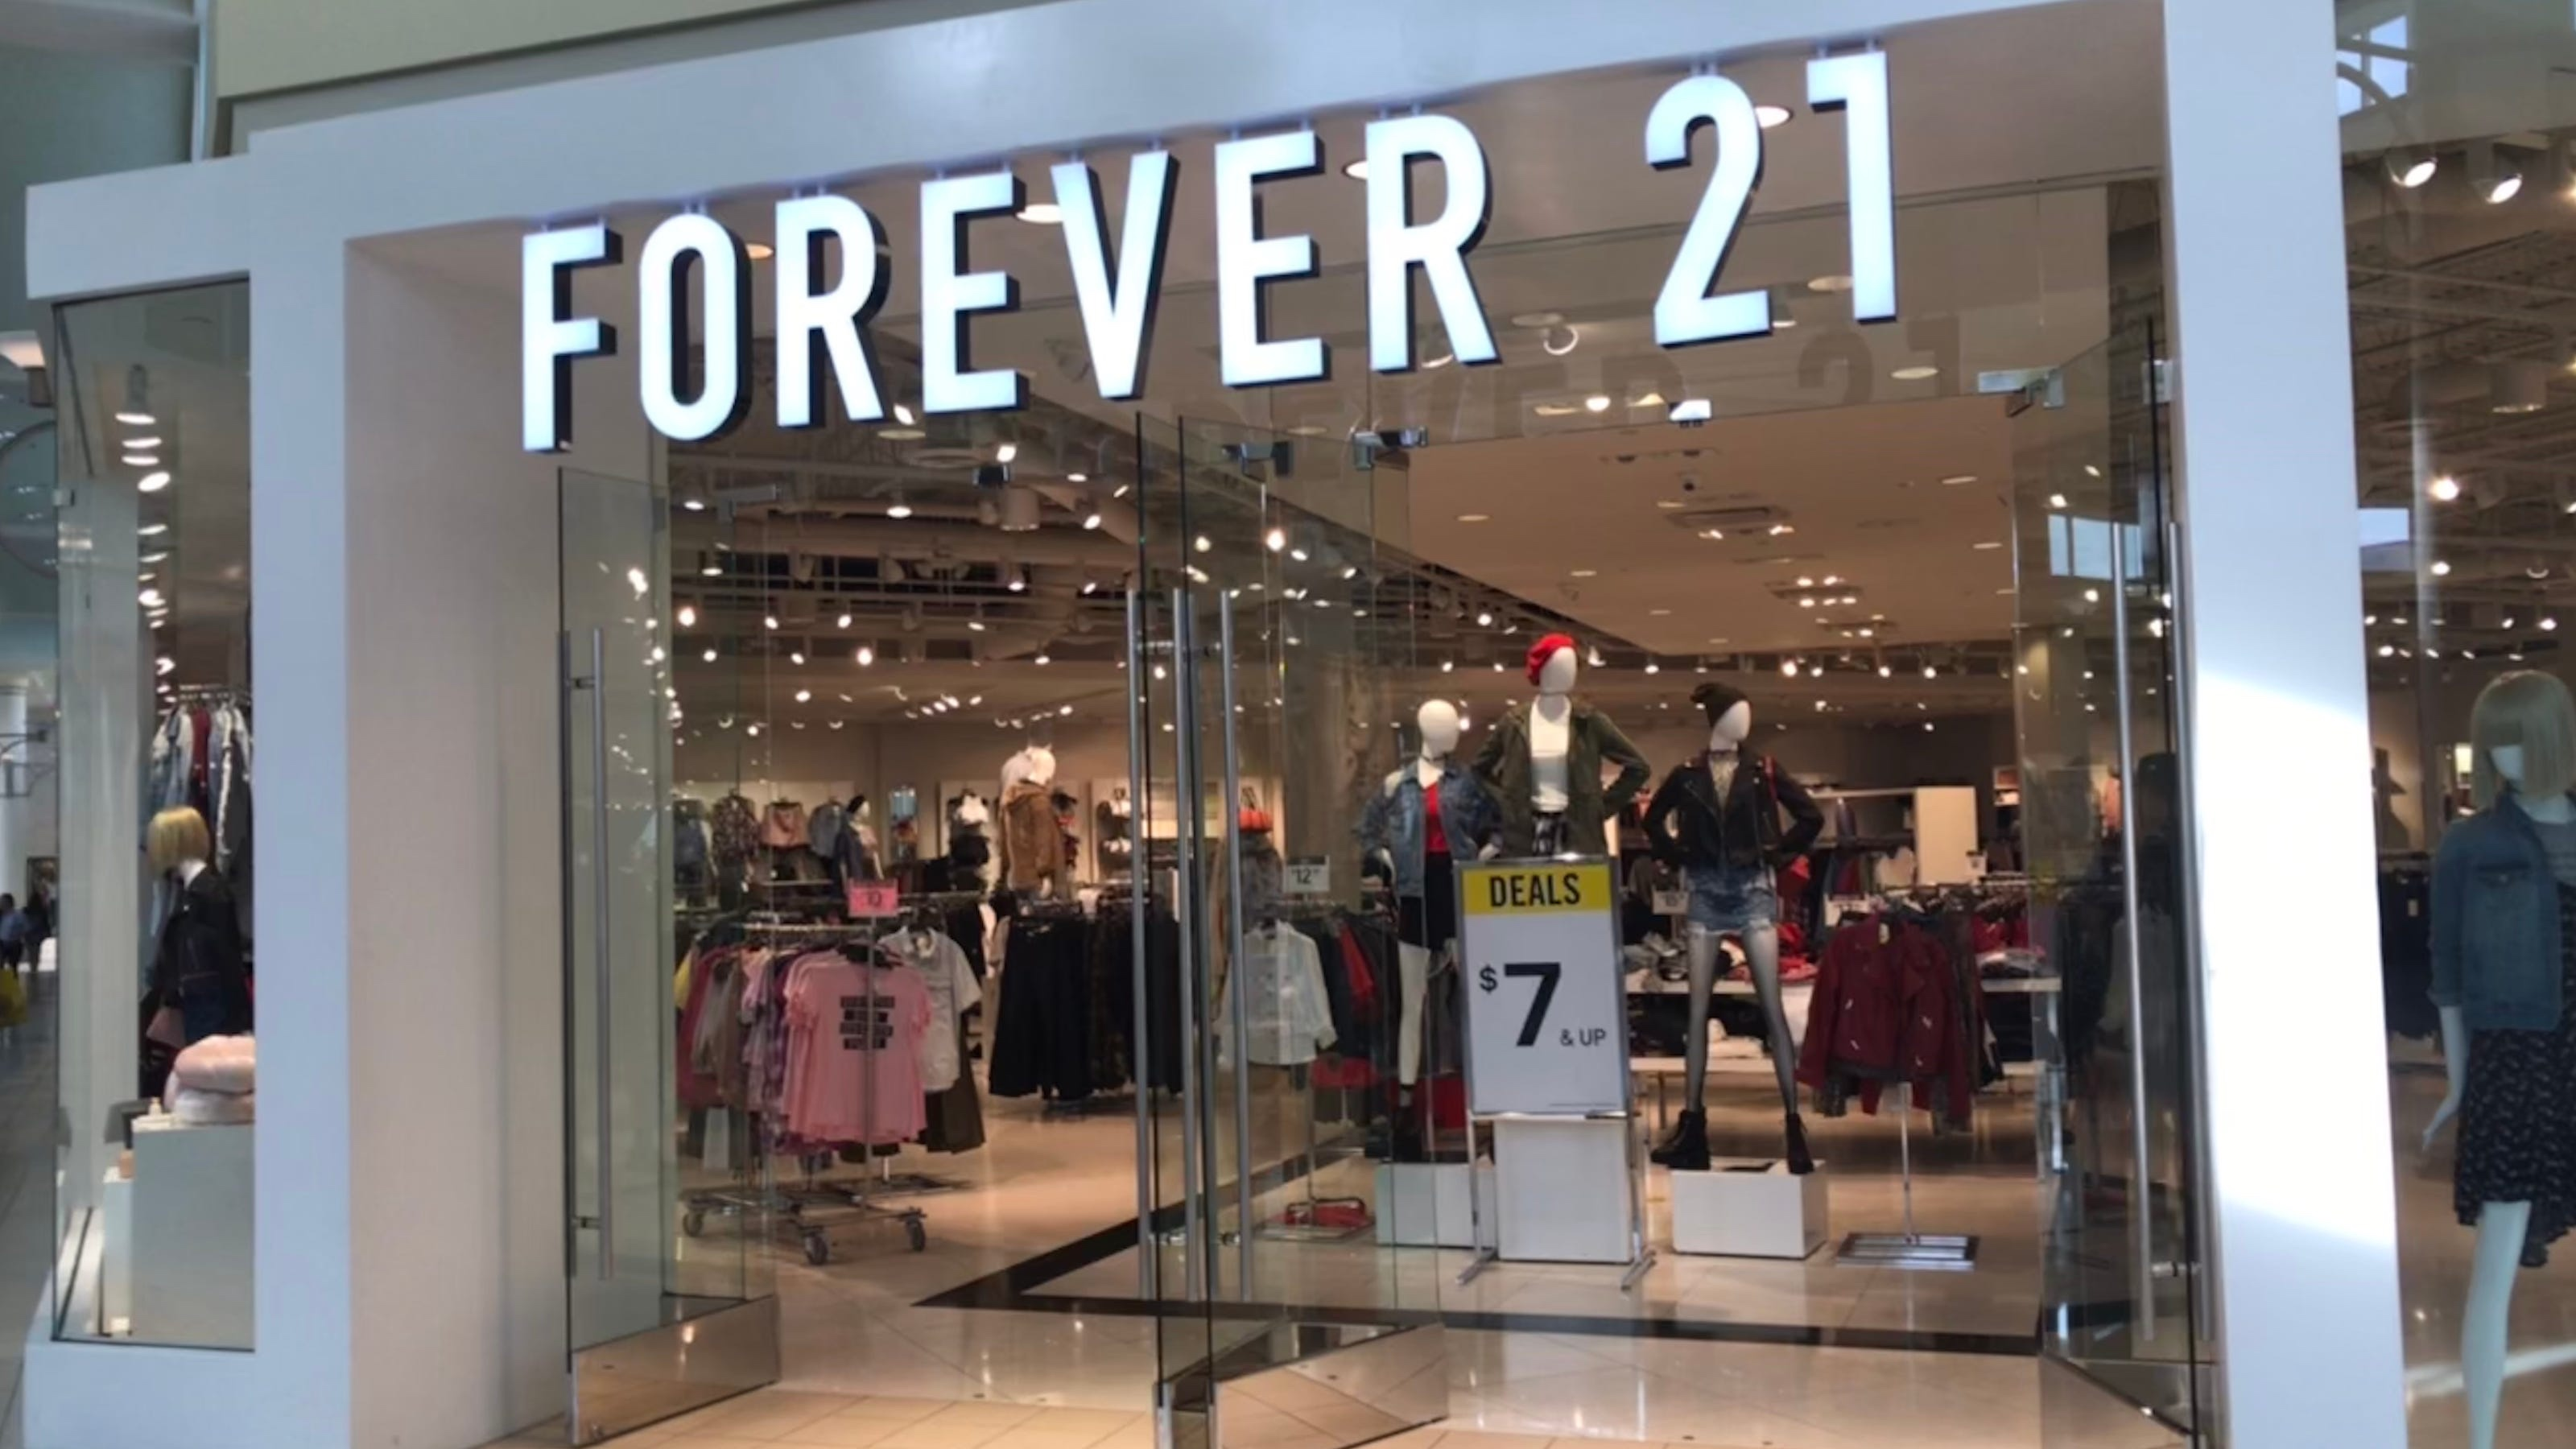 FOREVER 21 CLOSING THEIR DOORS FOREVER?!?!